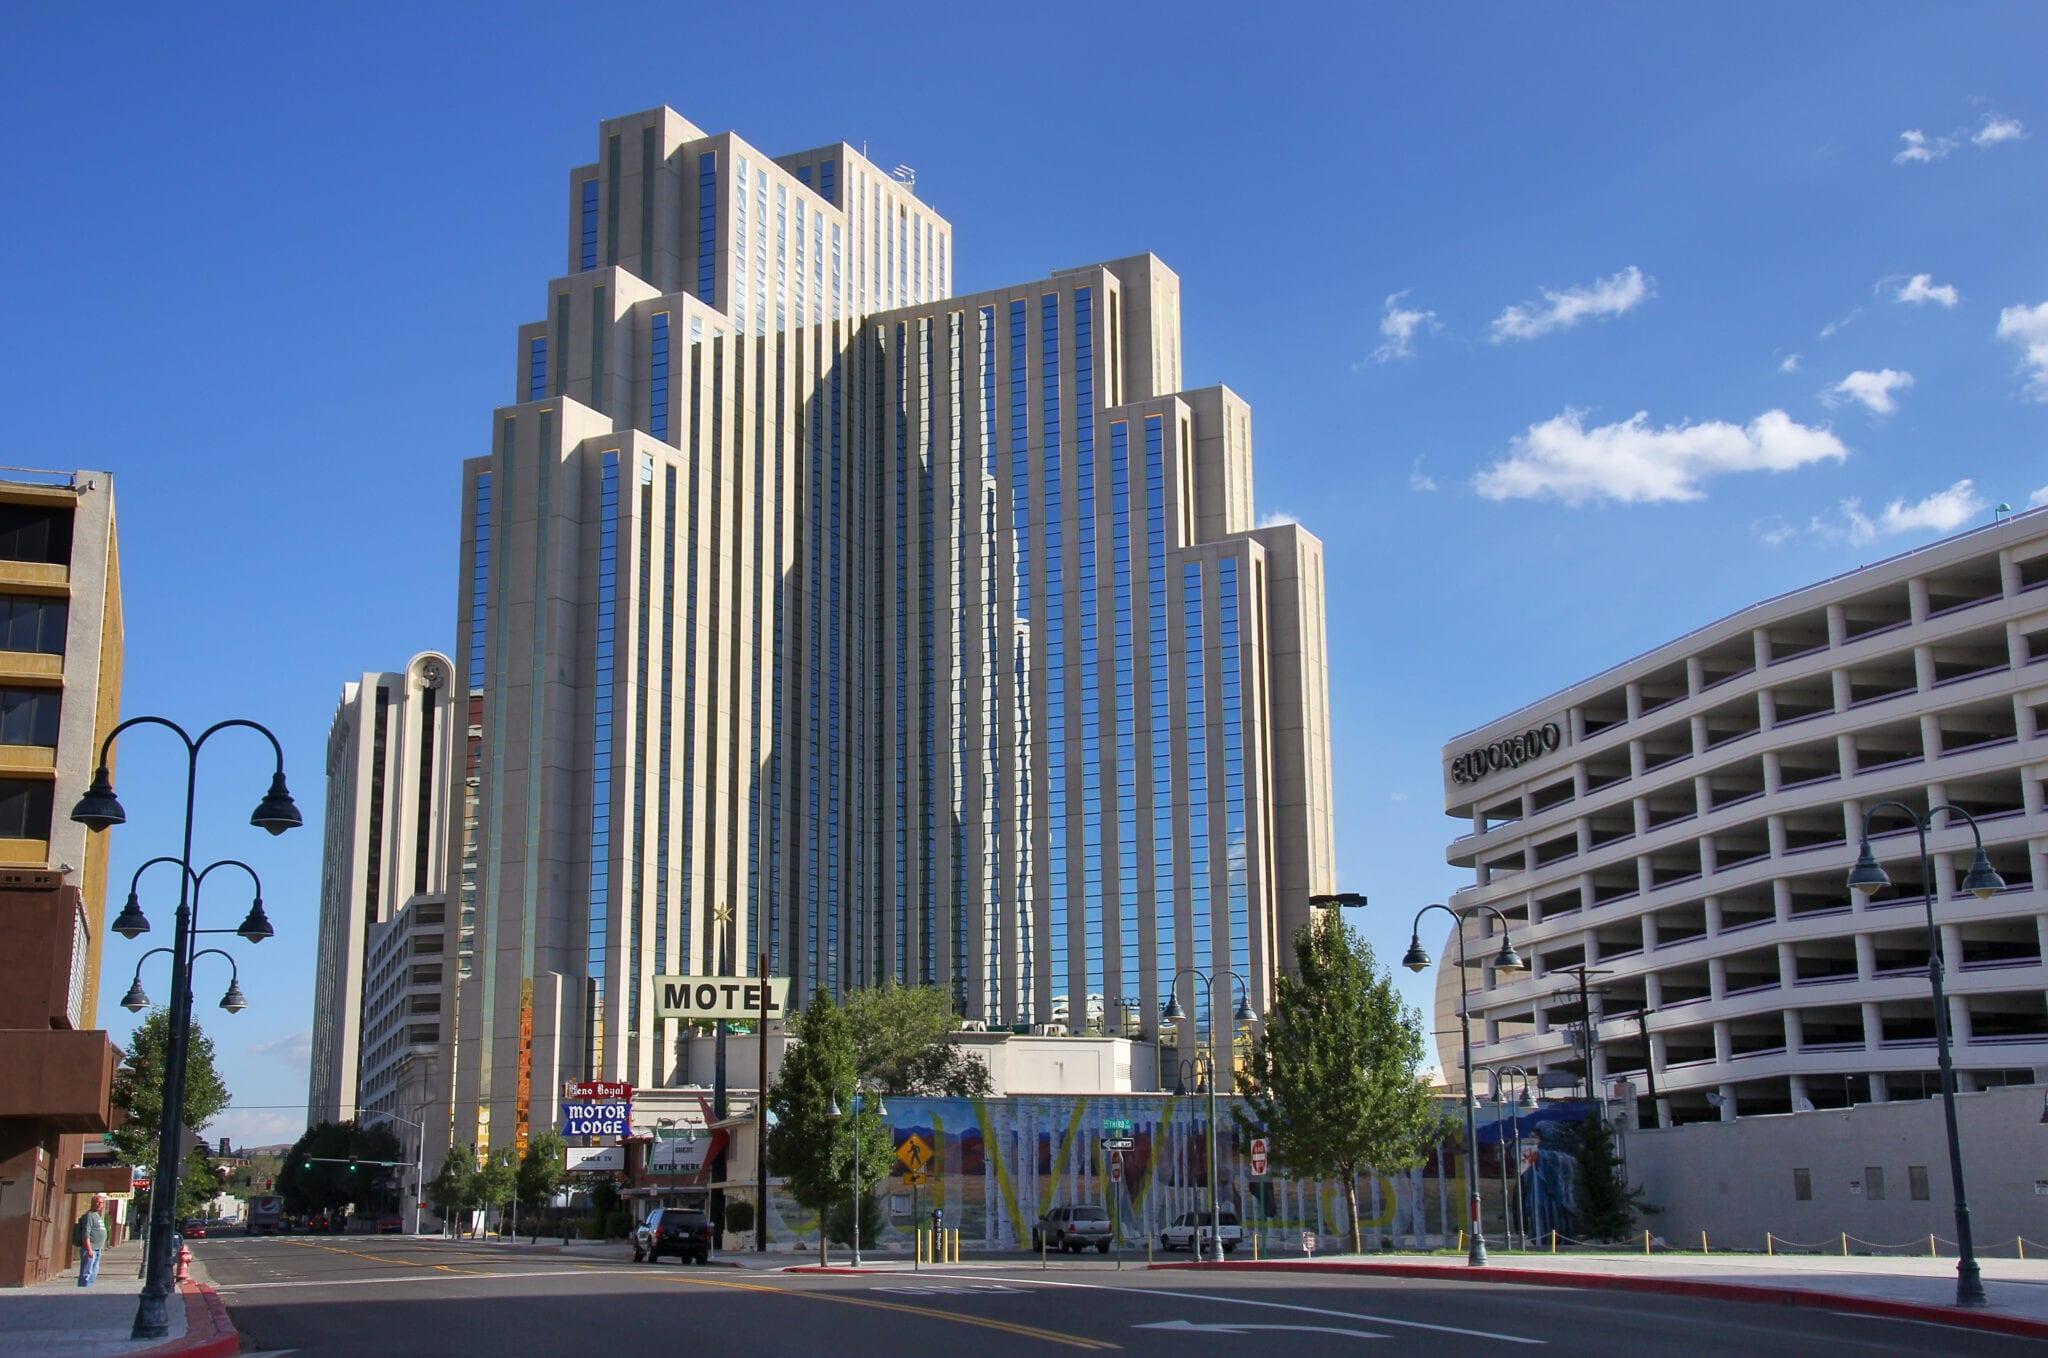 Reno Places to Spend Money Reno Places to Spend Money